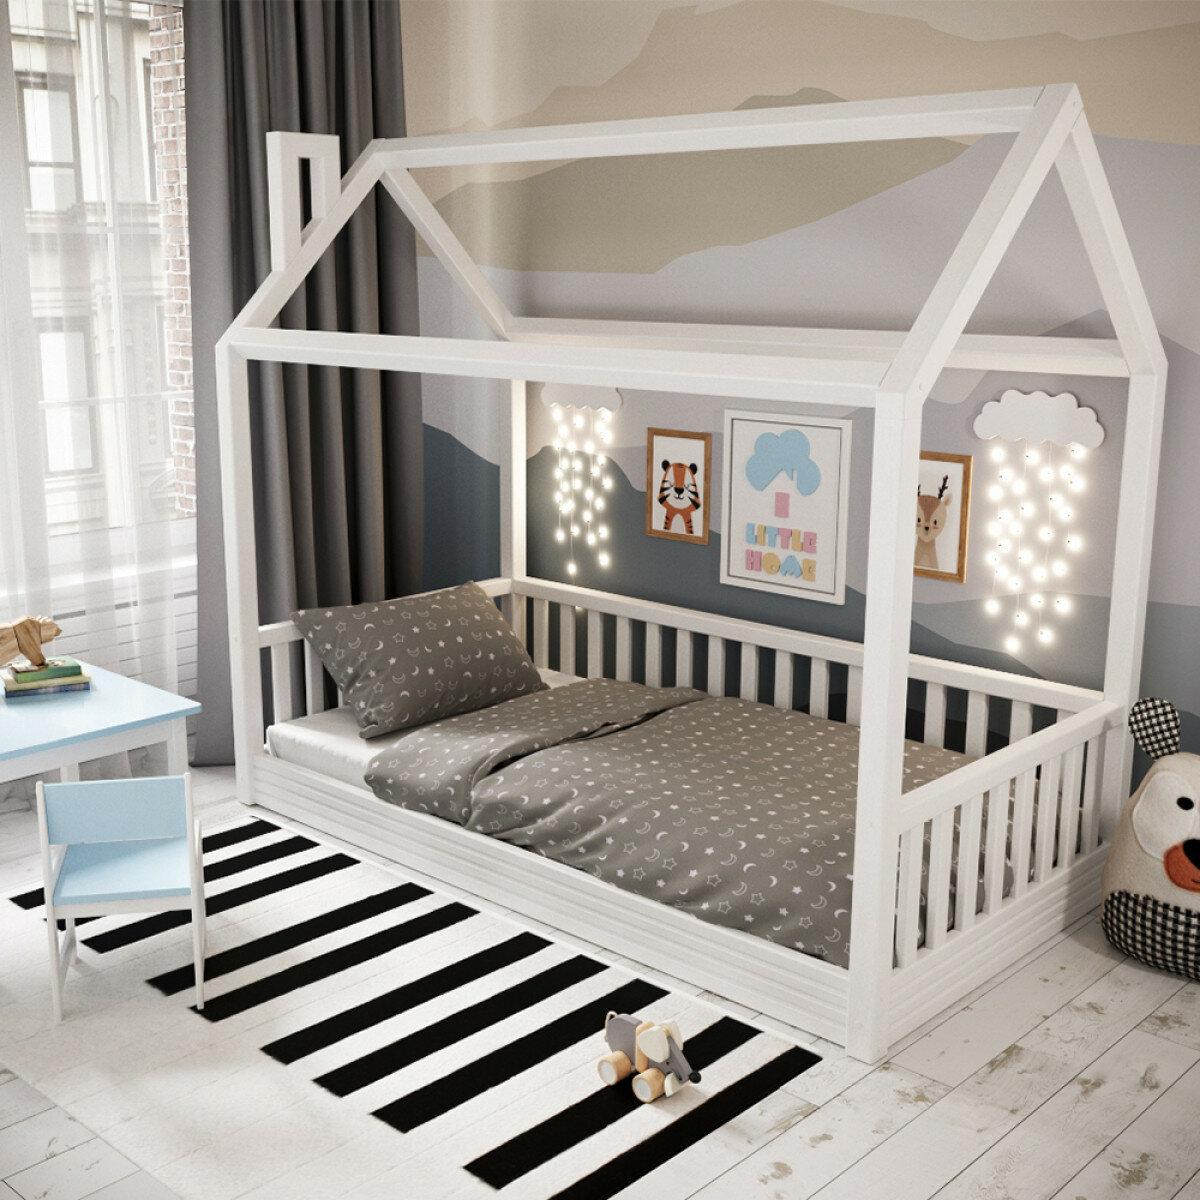 Фото кроватка в виде домика